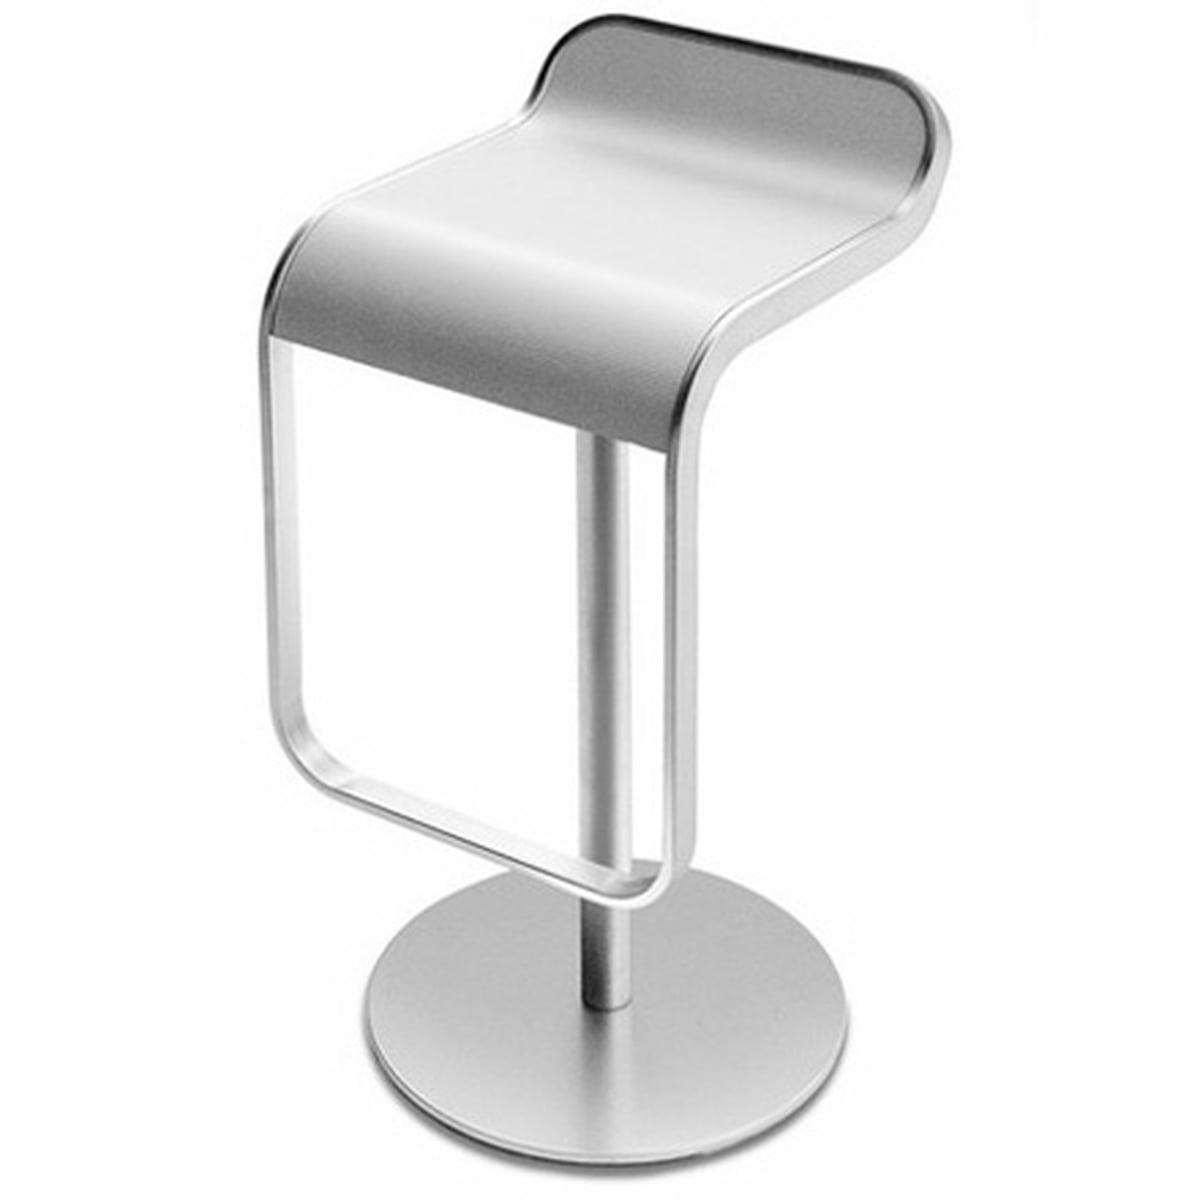 Pleasant Lapalma Lem Barstool Bleached Oak 80Cm Chrome Plated Frame Pdpeps Interior Chair Design Pdpepsorg